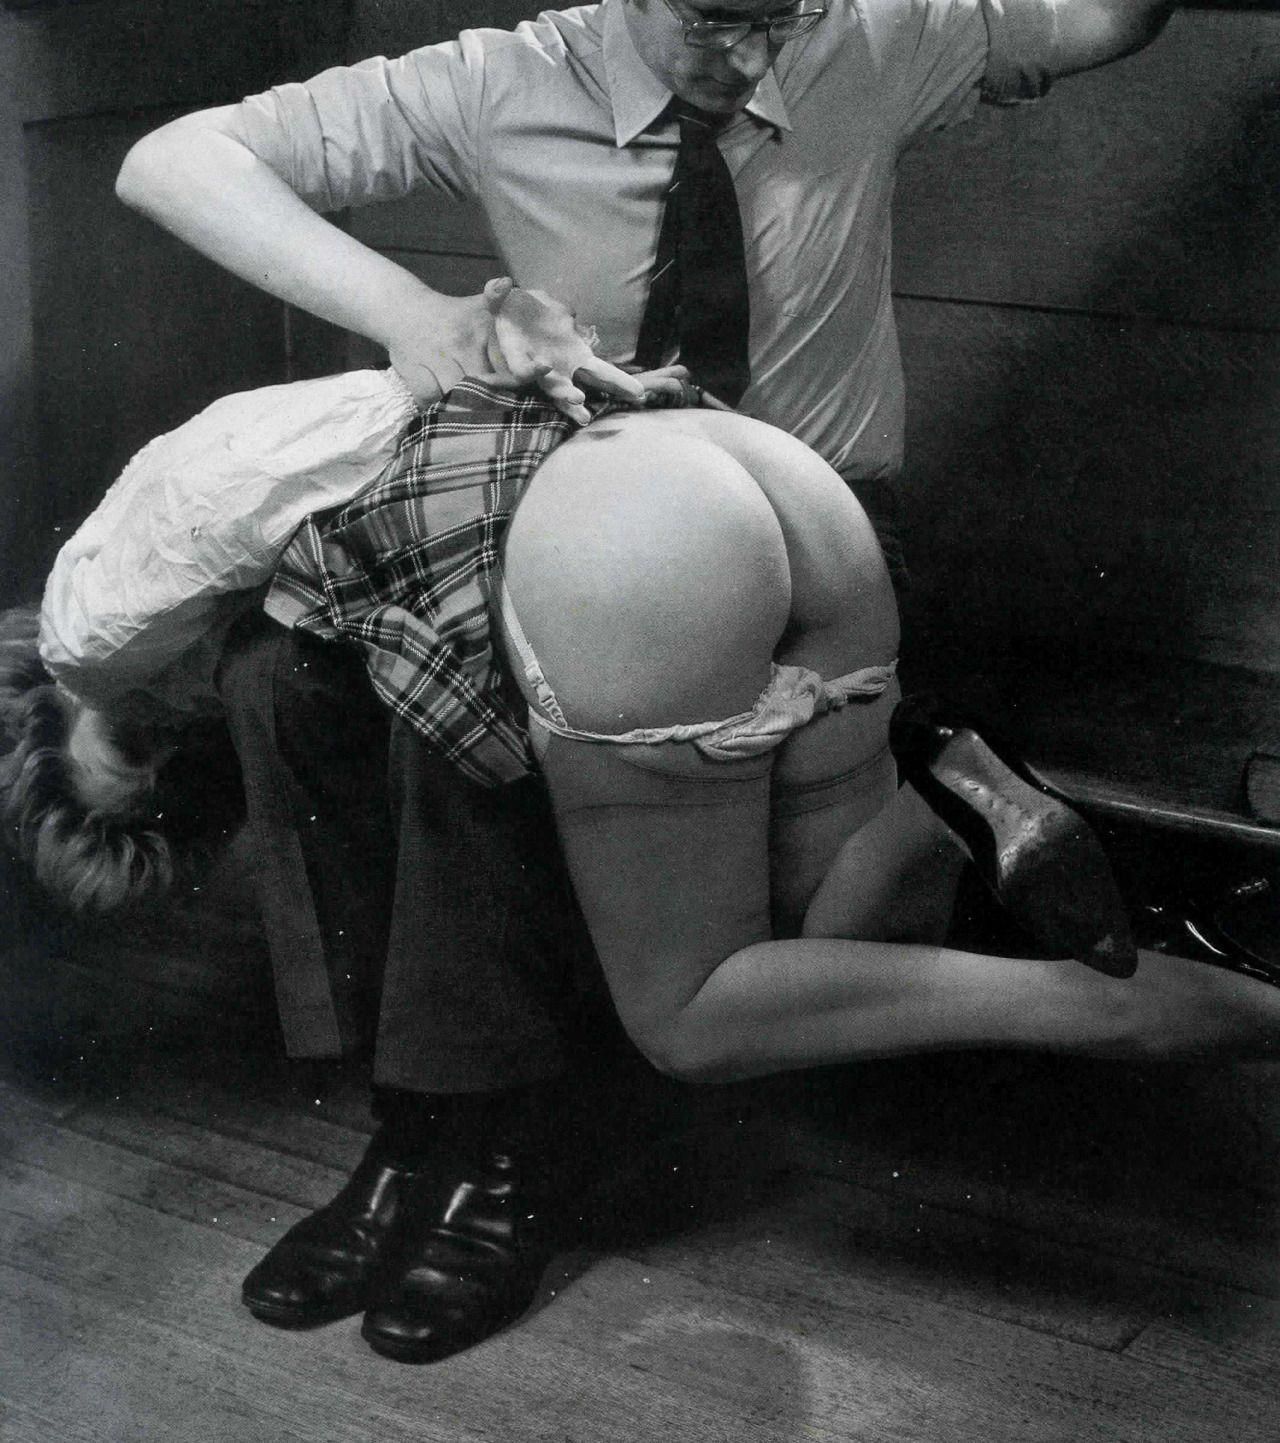 Spanking over knee